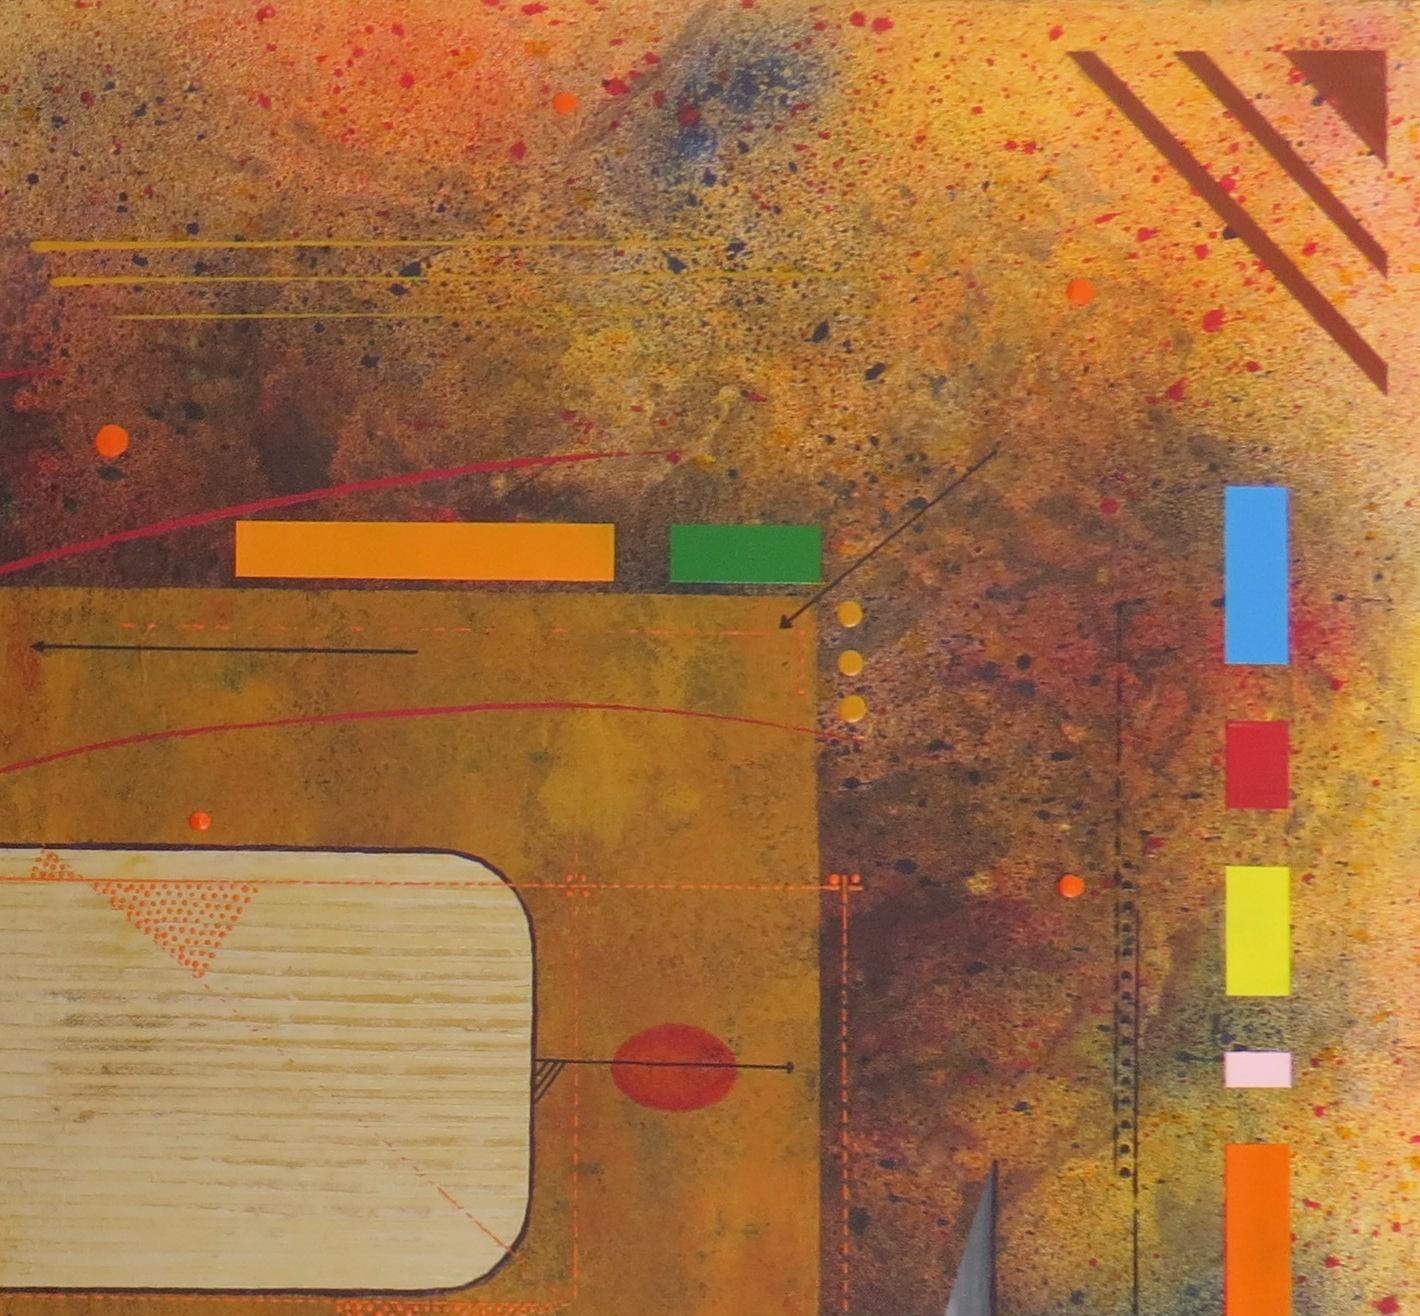 kappa - zoom1 - DALUZ GALEGO - peinture abstraite